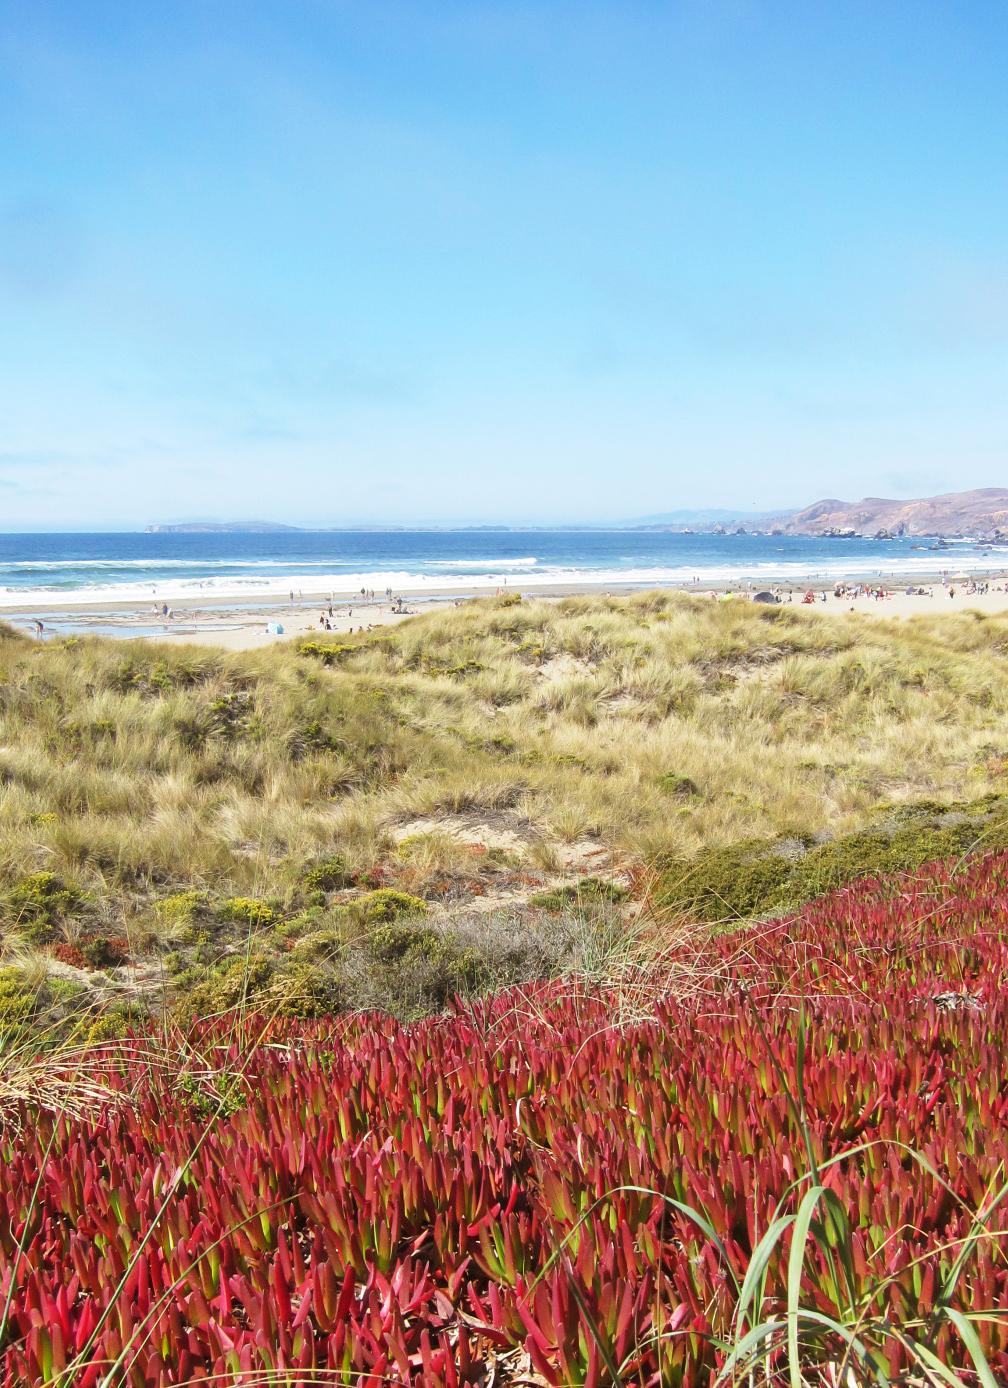 Dillon Beach, Highway 1 north of San Francisco